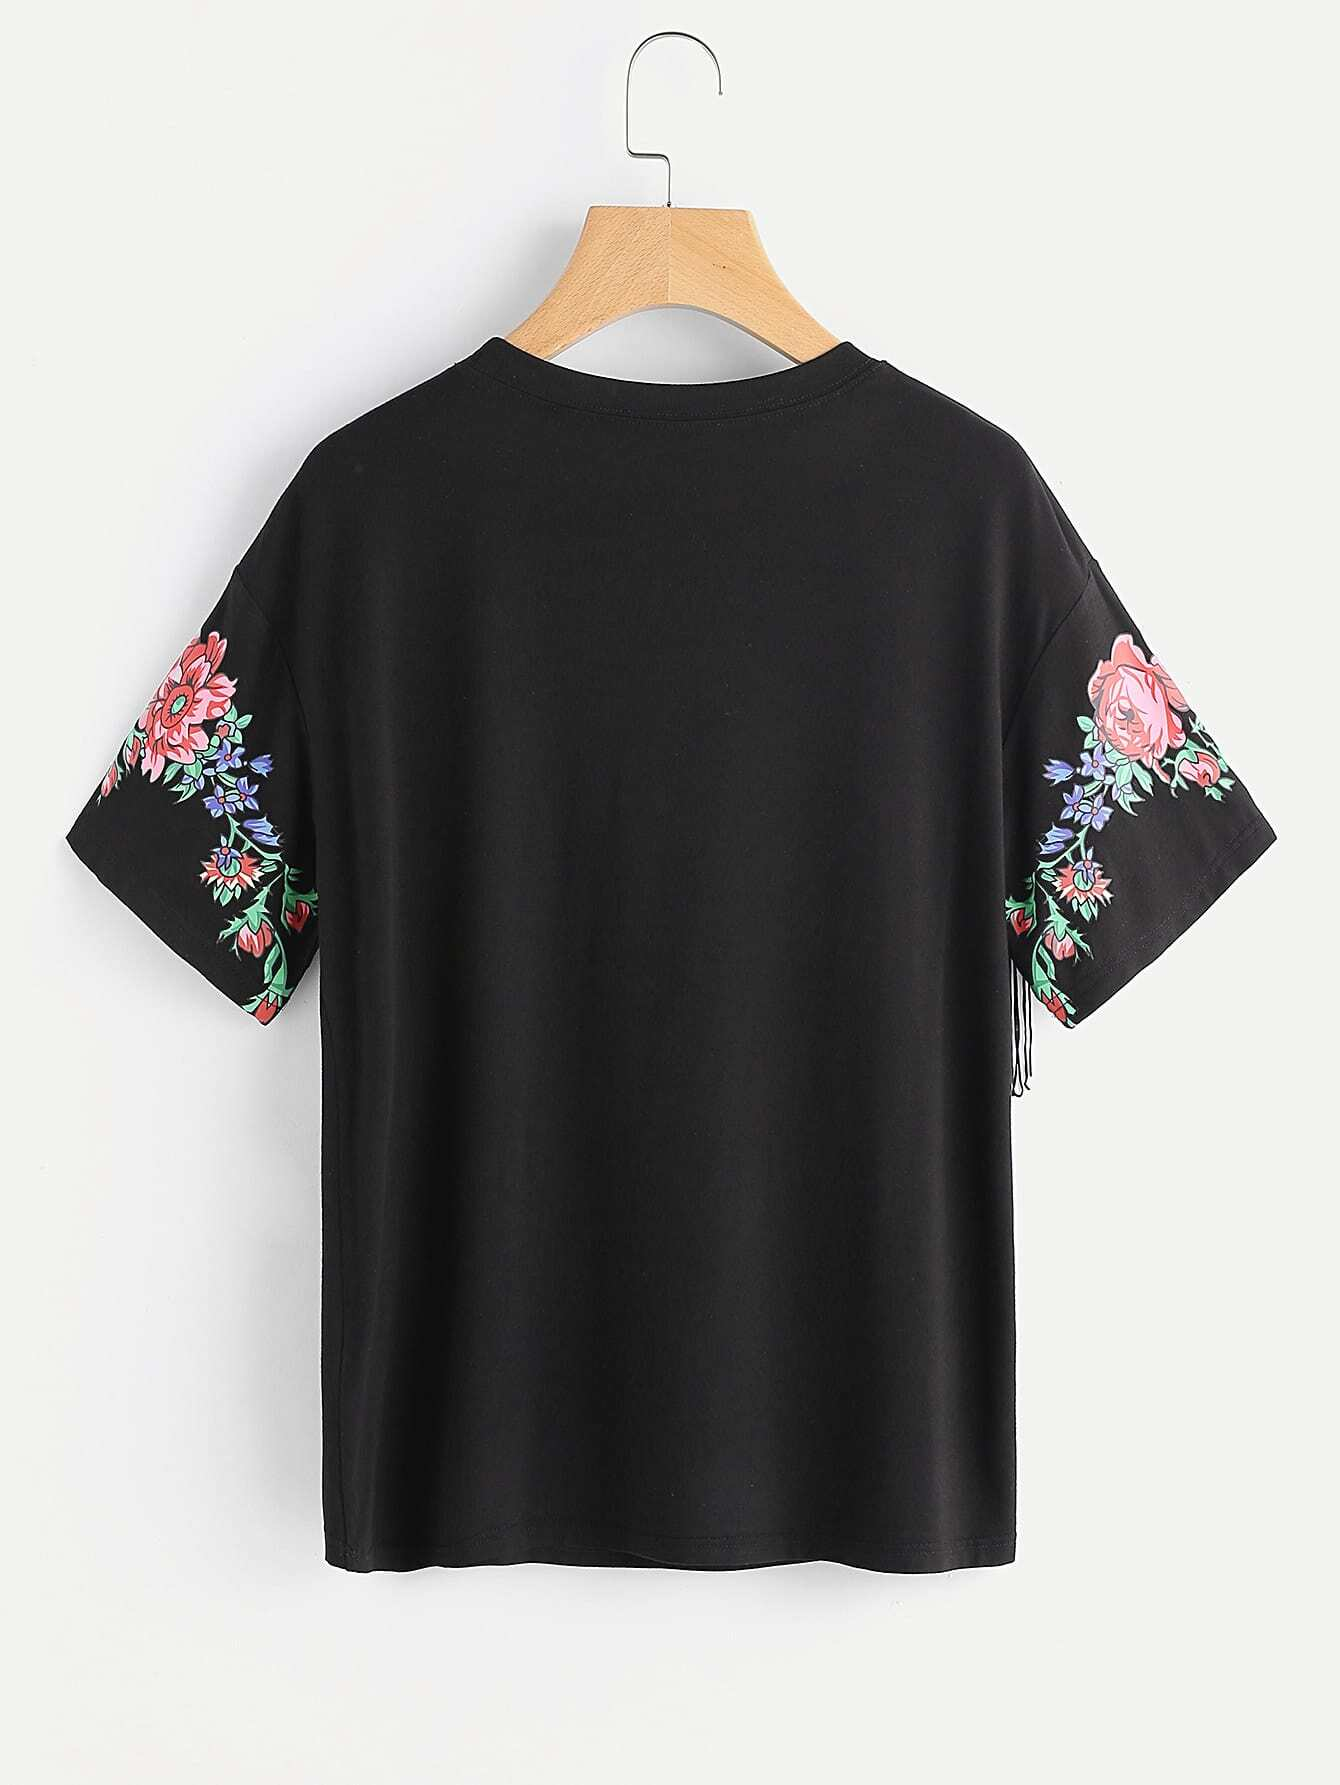 tee shirt d coup imprim des fleurs avec des franges. Black Bedroom Furniture Sets. Home Design Ideas